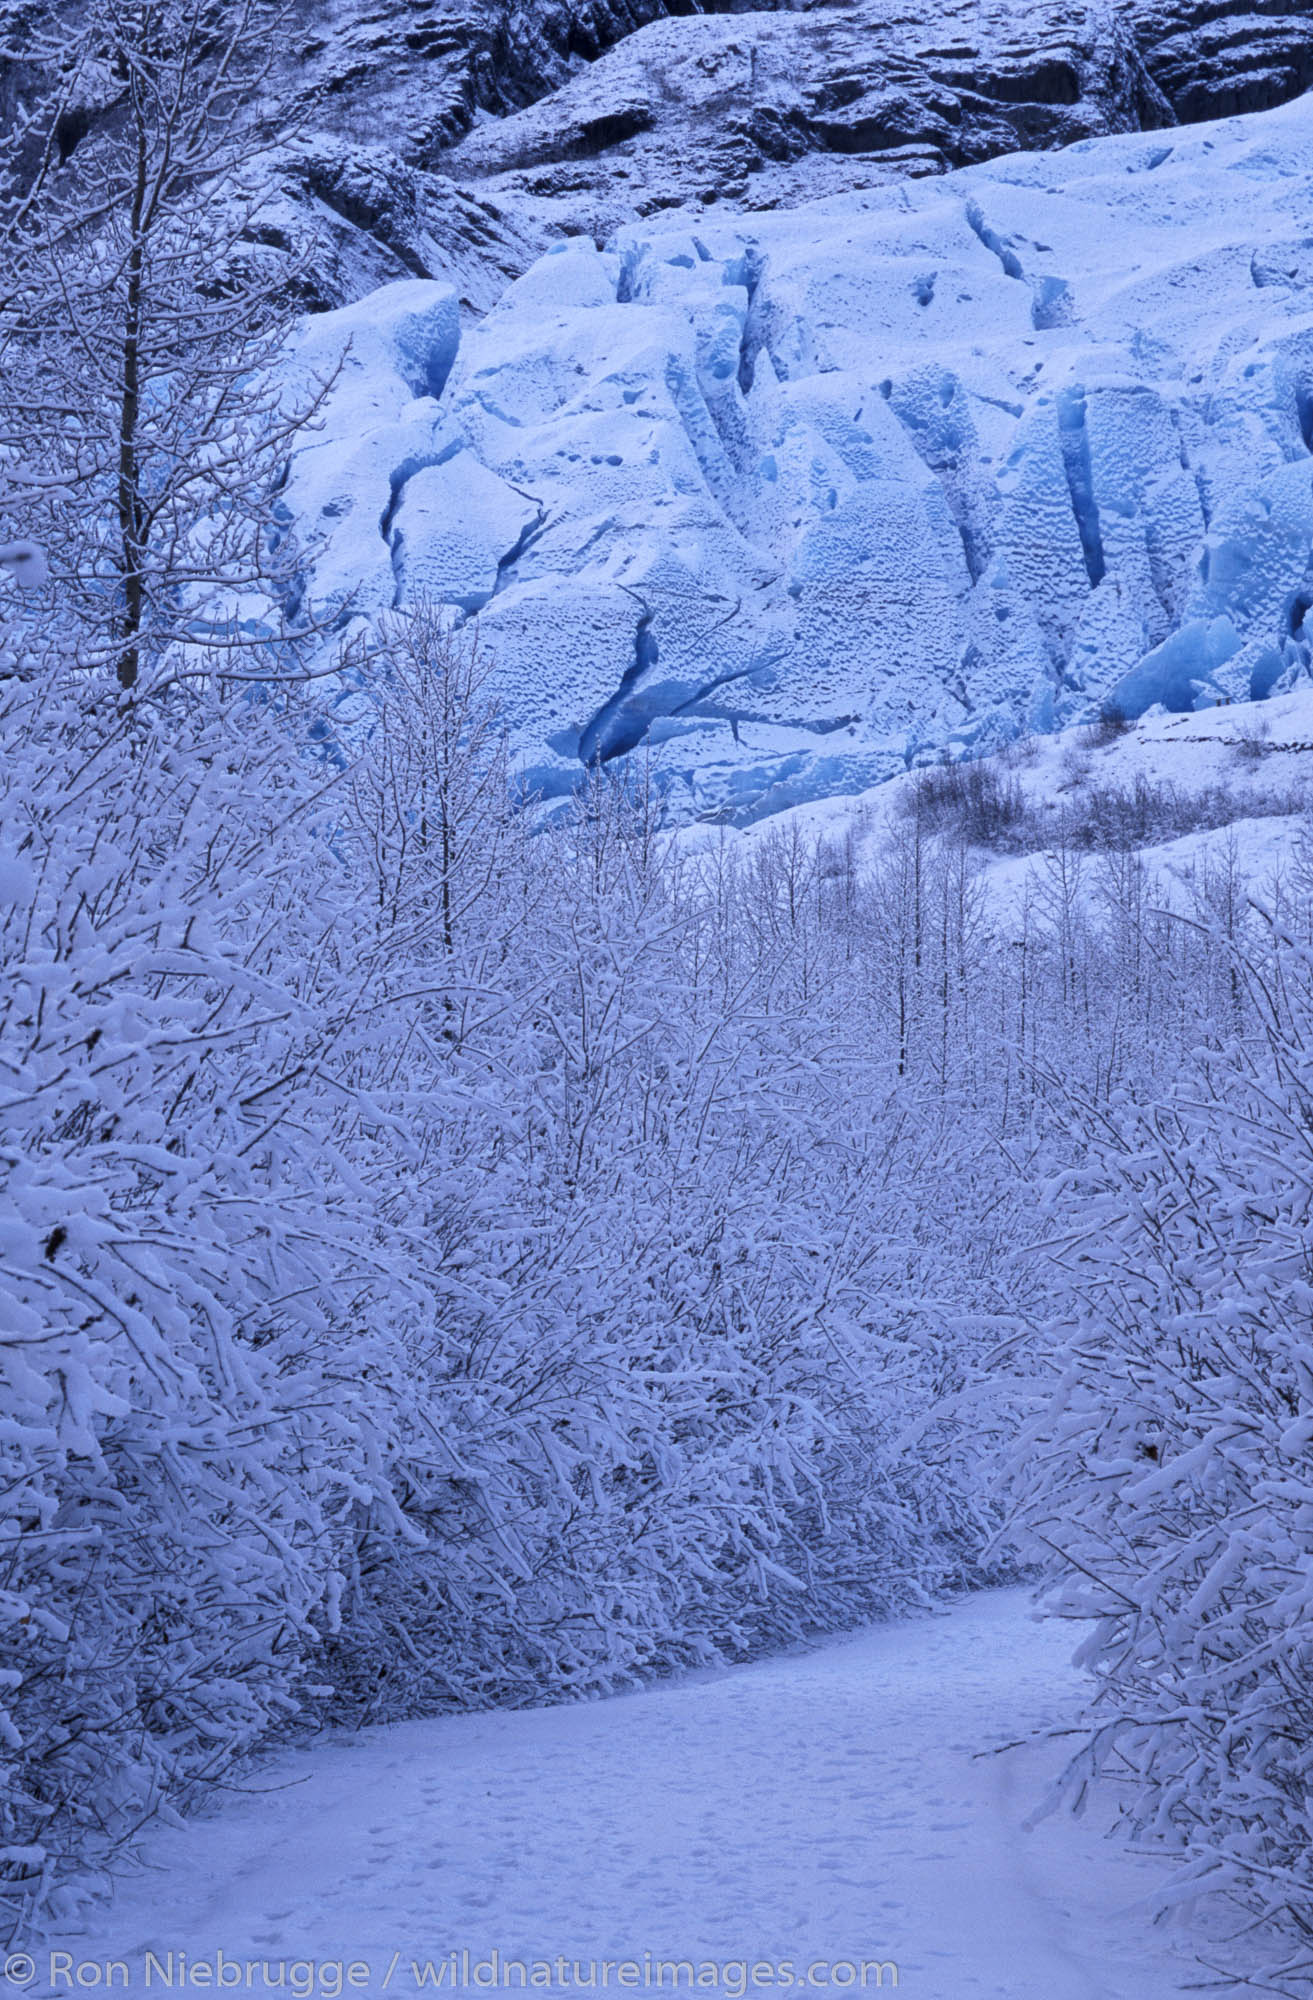 Exit Glacier during the winter, Kenai Fjords National Park, near Seward Alaska.